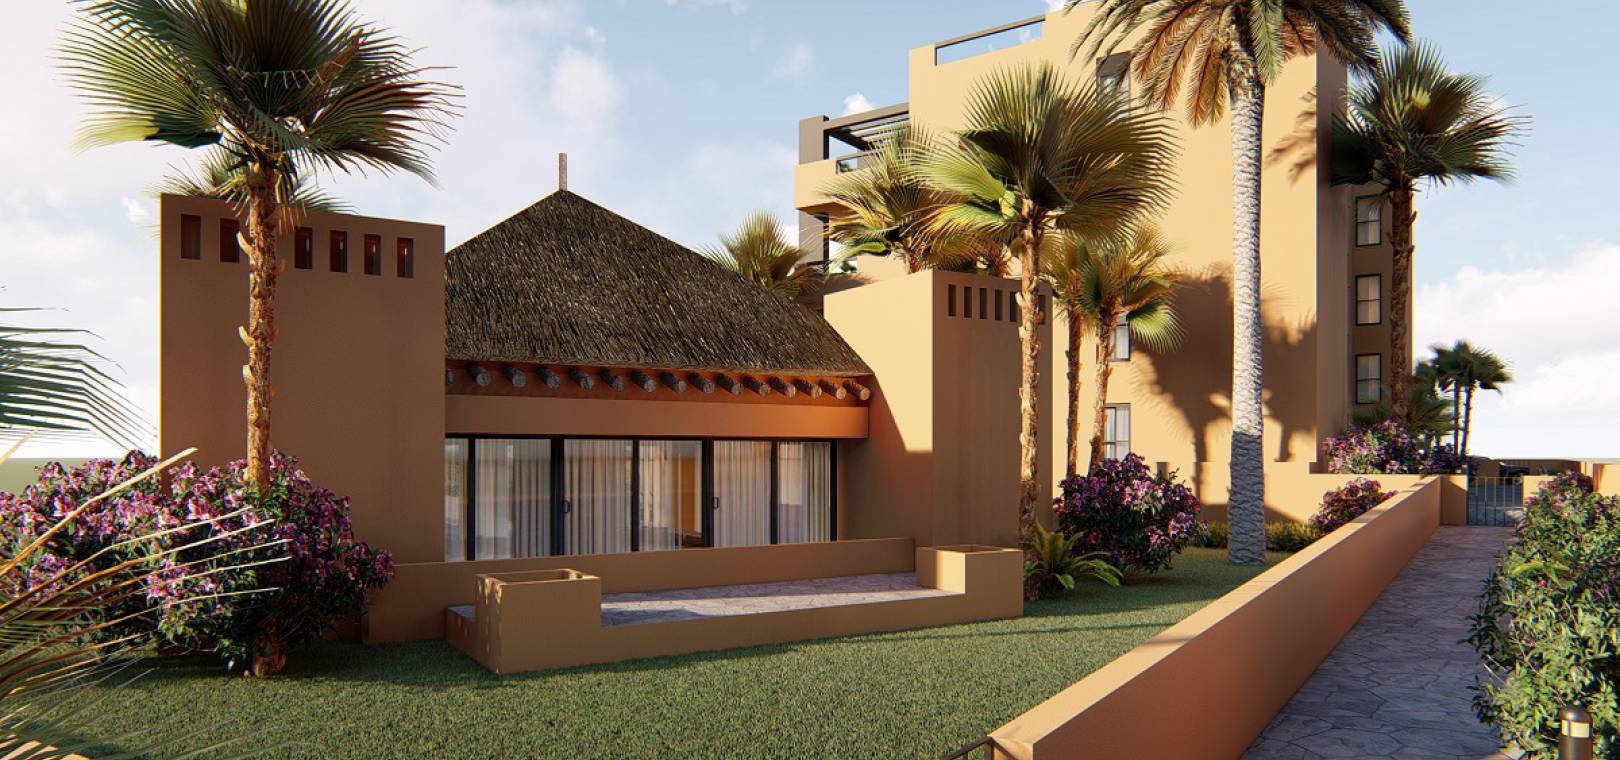 Palapa_Golf_Villamartin_New_Build_Properties_For_Sale_1